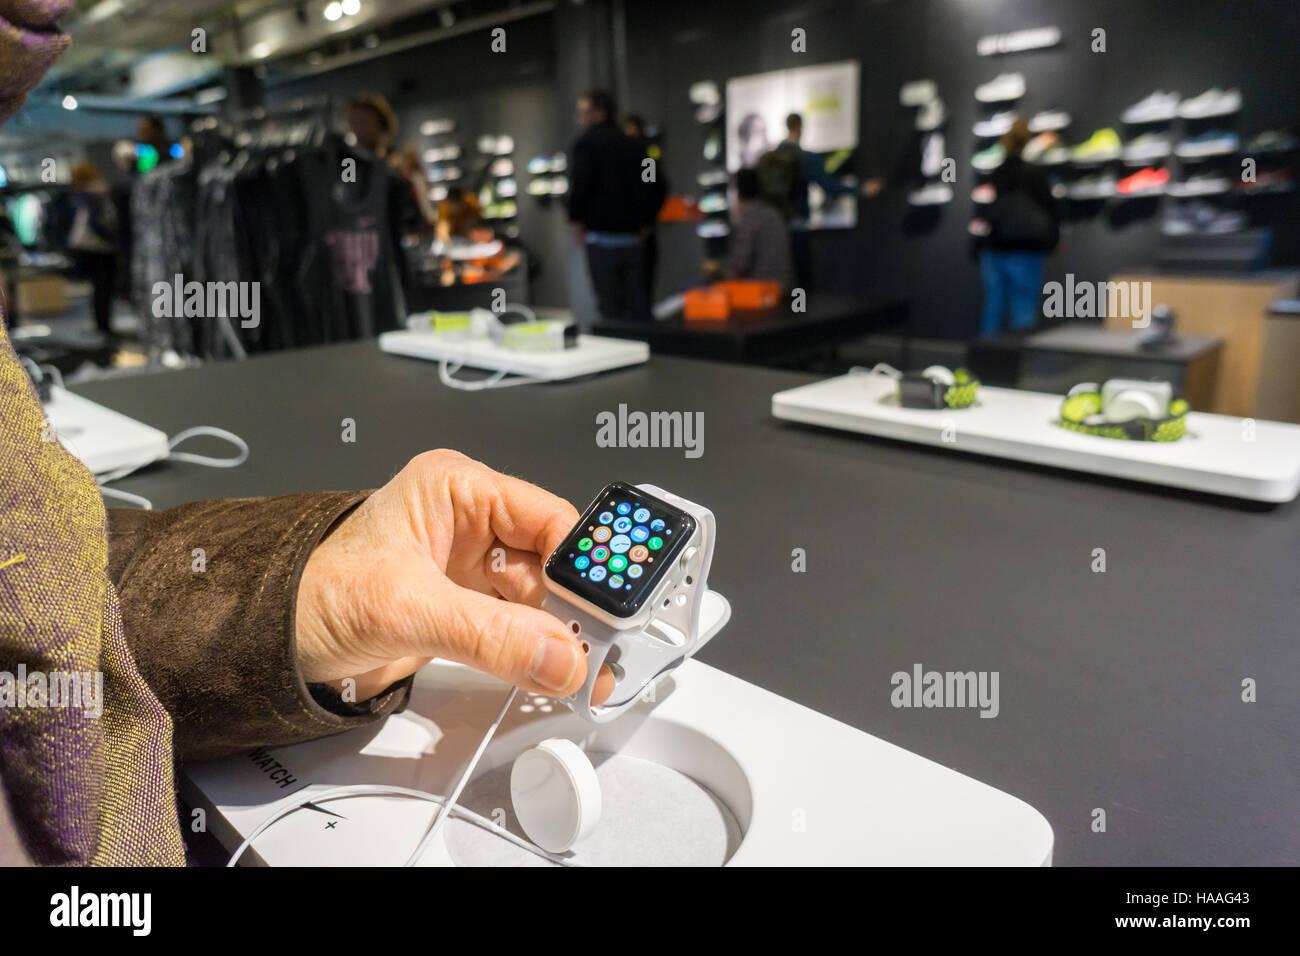 Nike Chaussure Chaussure Apple Watch Apple Watch Watch Nike Apple 76fbYgy